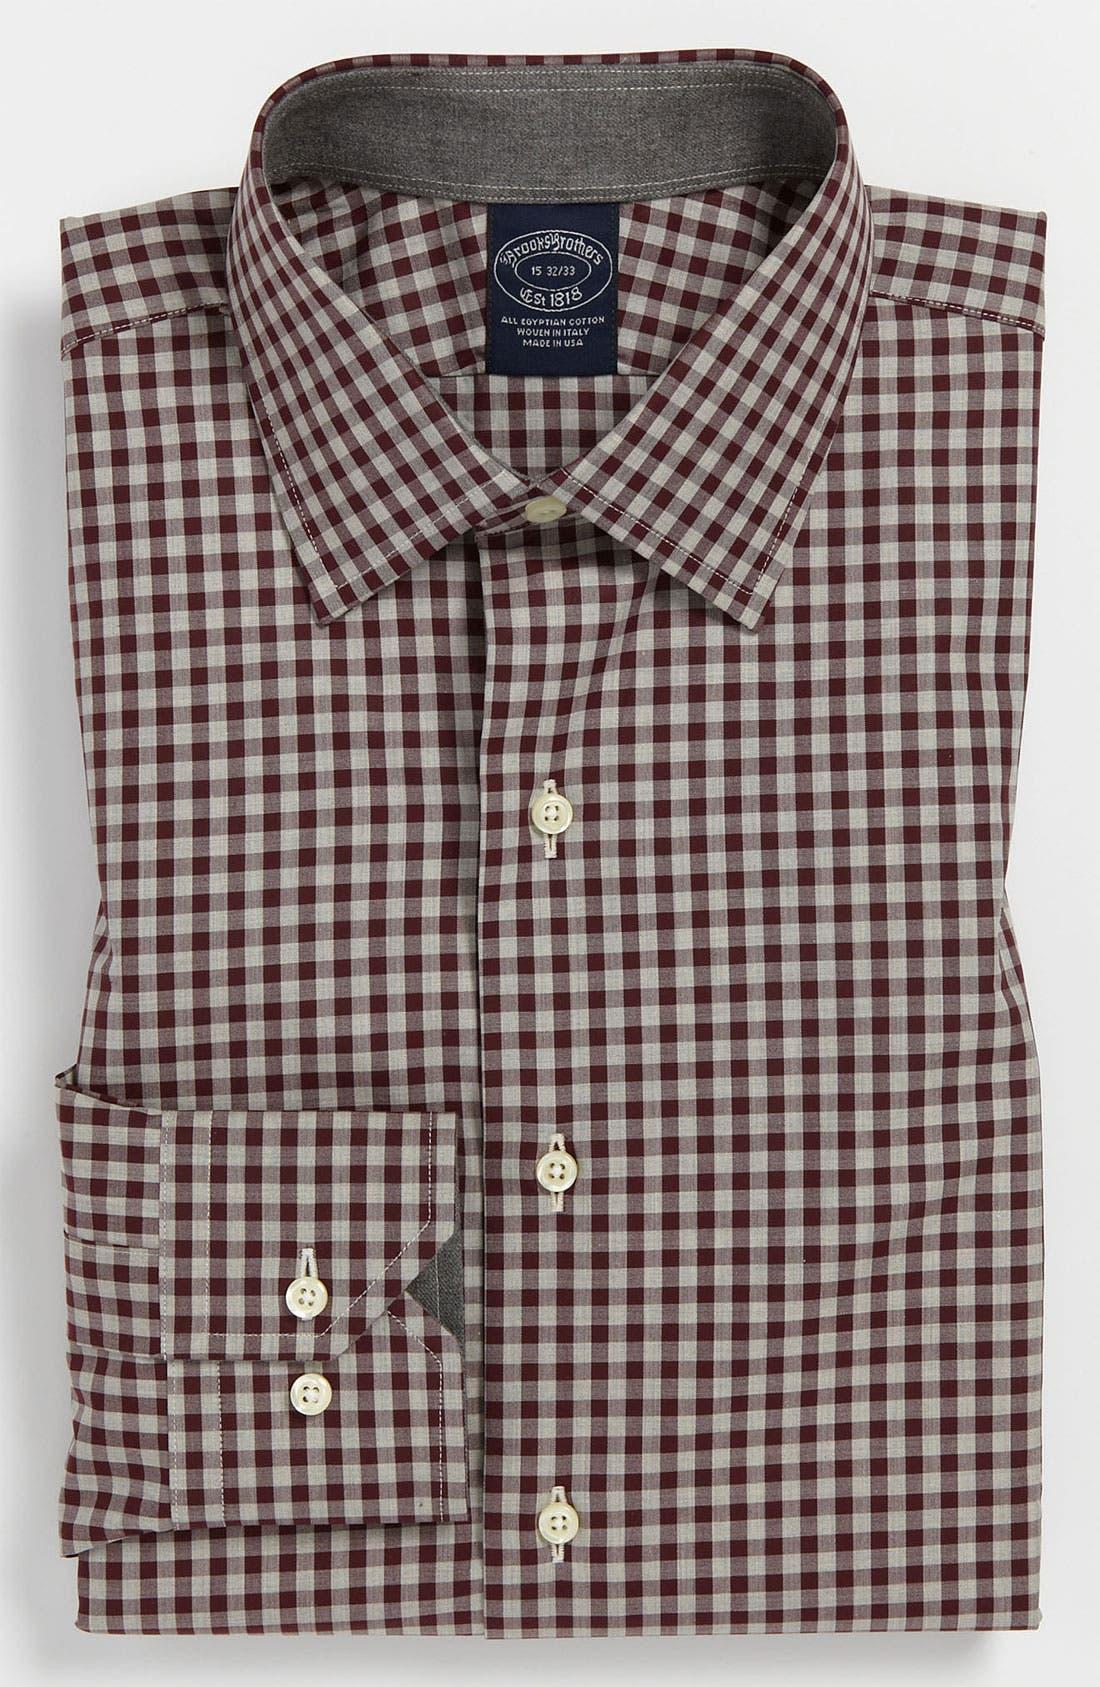 Alternate Image 1 Selected - Brooks Brothers Regular Fit Dress Shirt